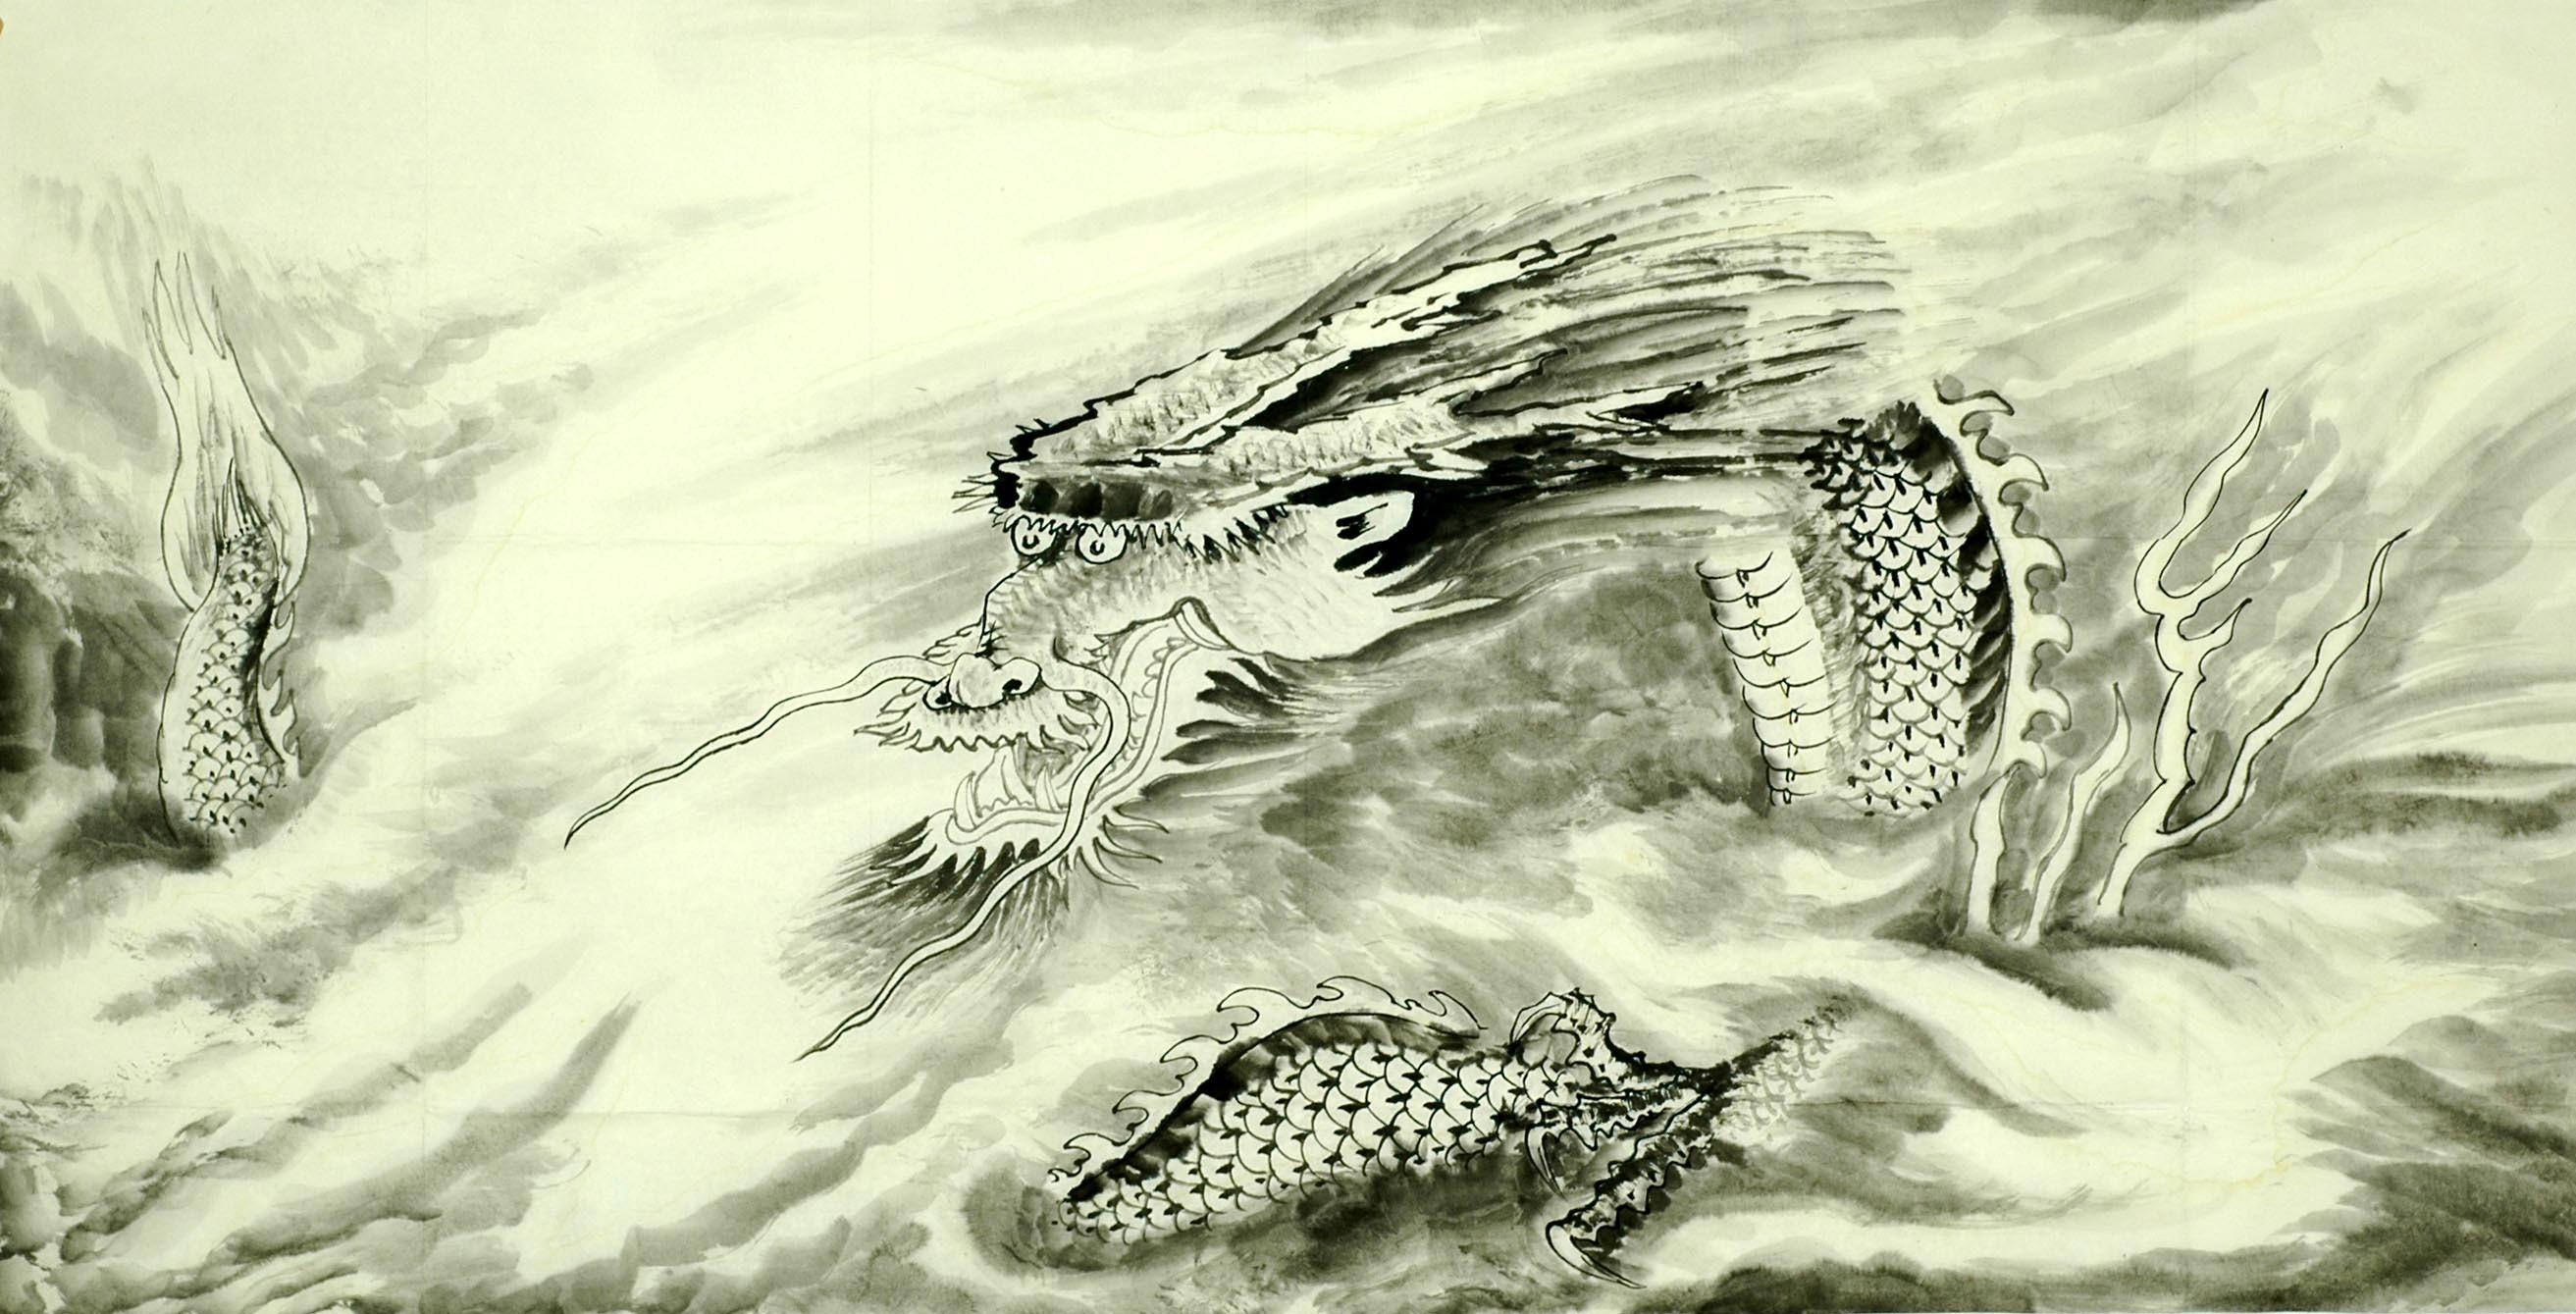 Chinese Dragon Painting - CNAG008724